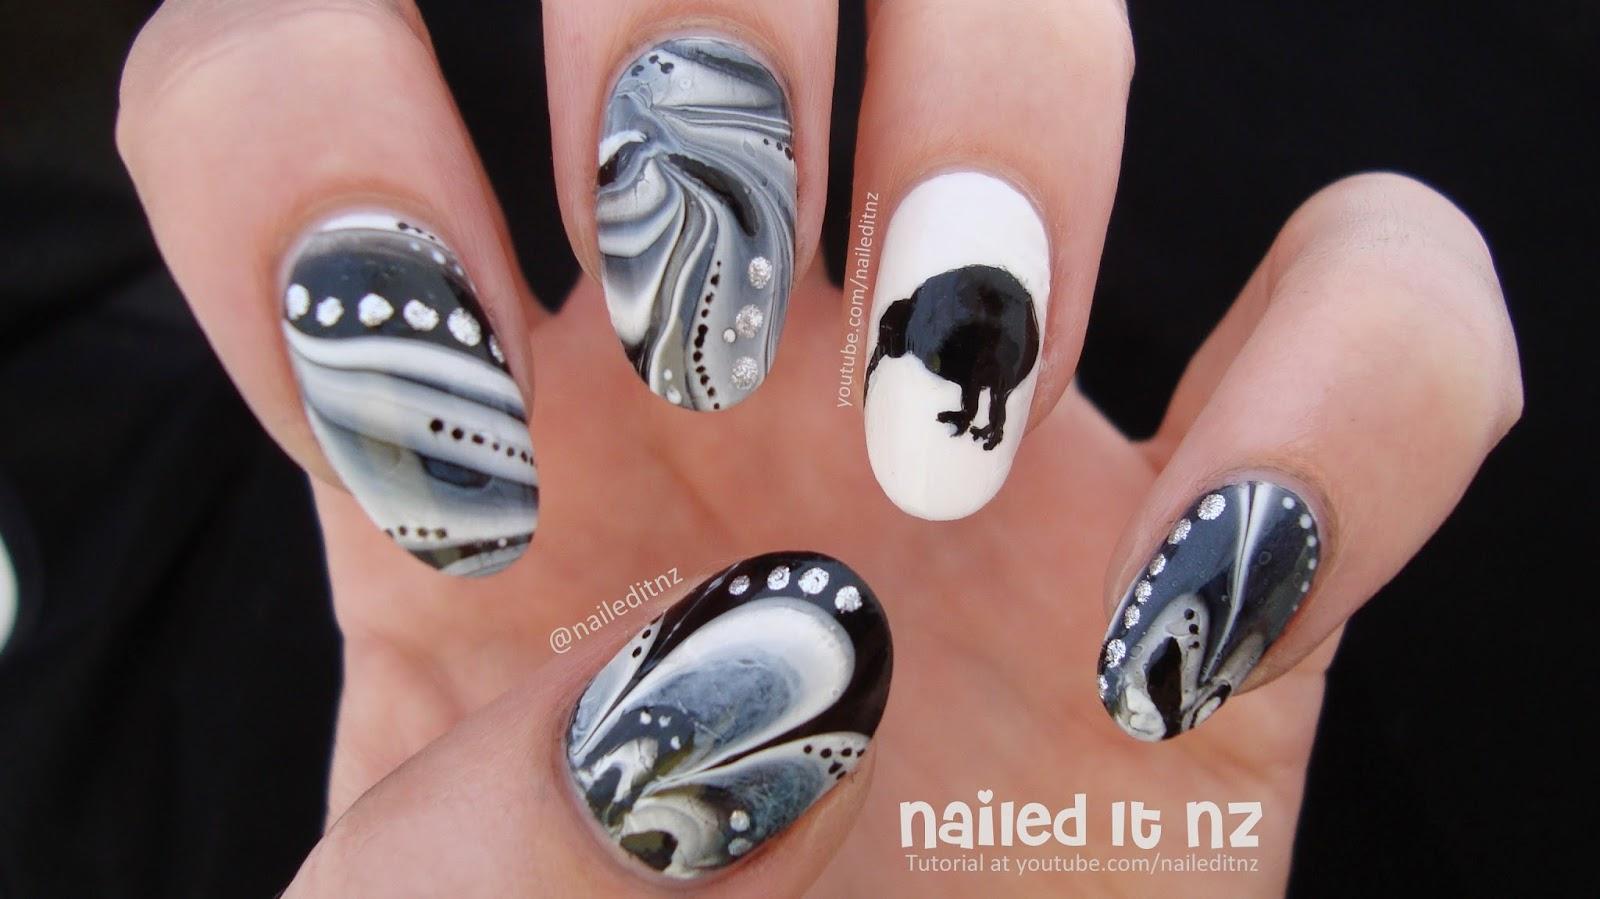 Nail Art Mash Up #1 - Cinderella, The Very Hungry Caterpillar & more!